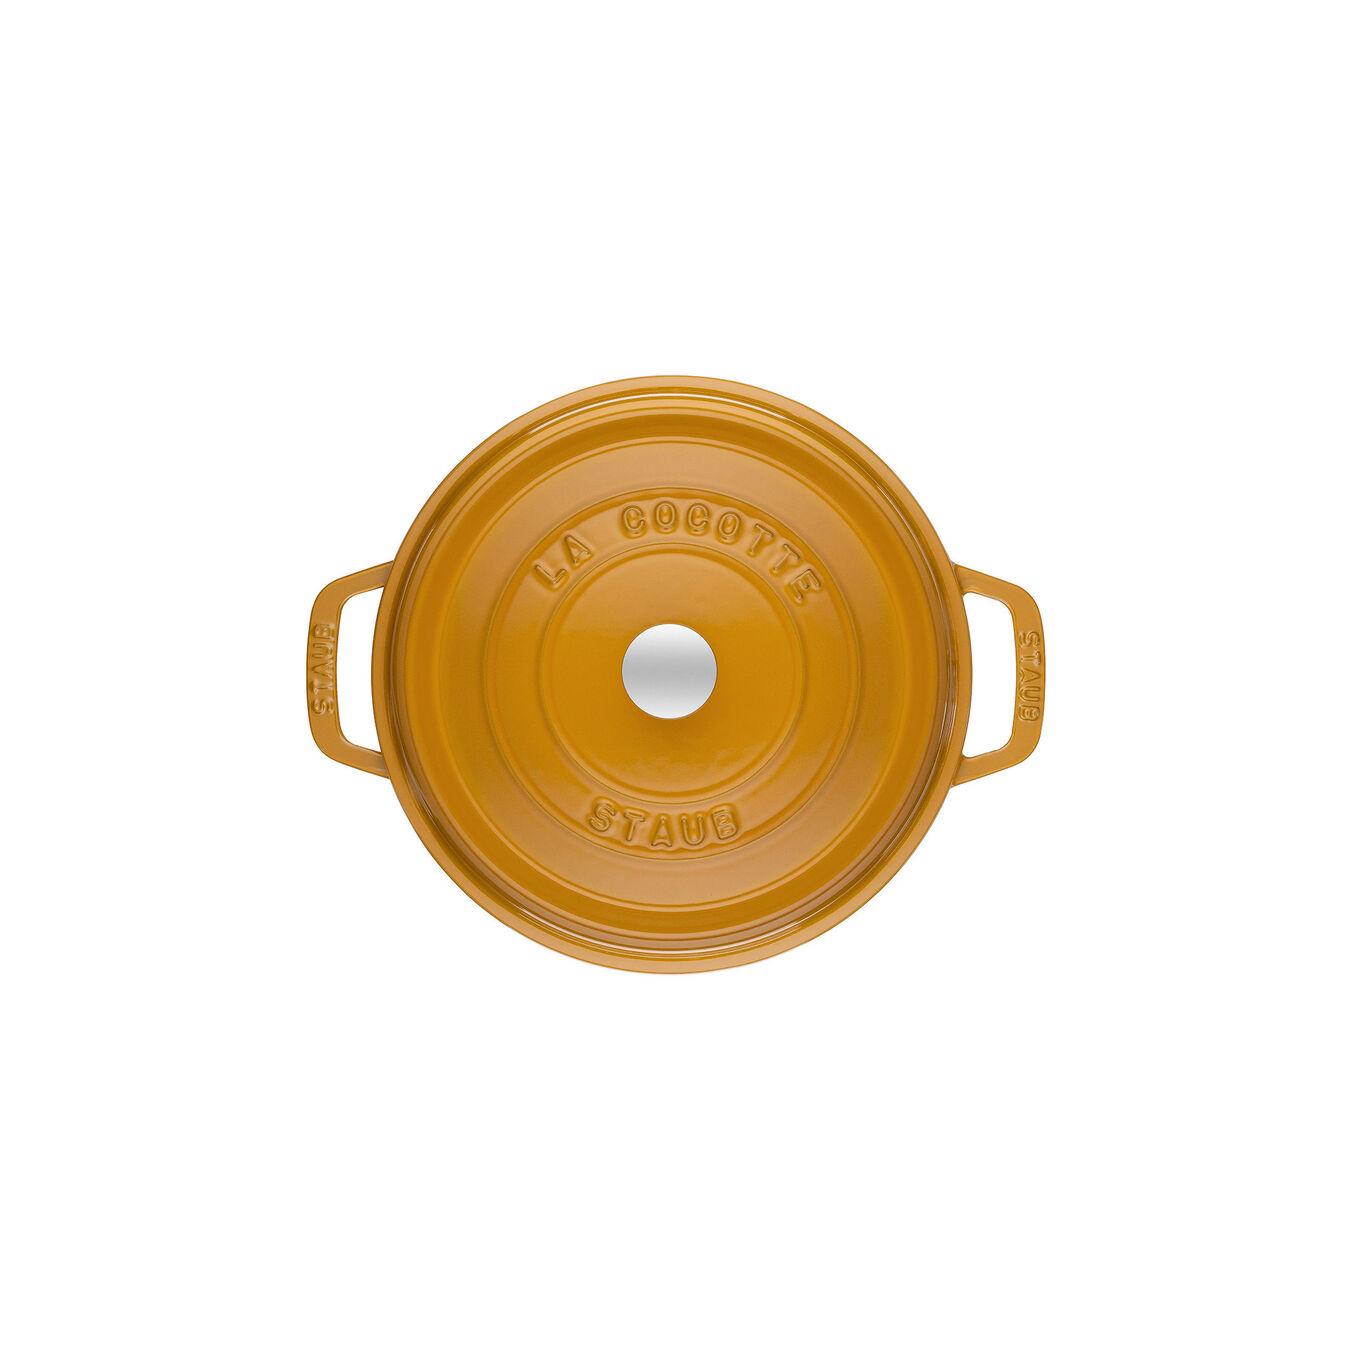 Cocotte 20 cm, Rond(e), Moutarde, Fonte,,large 2